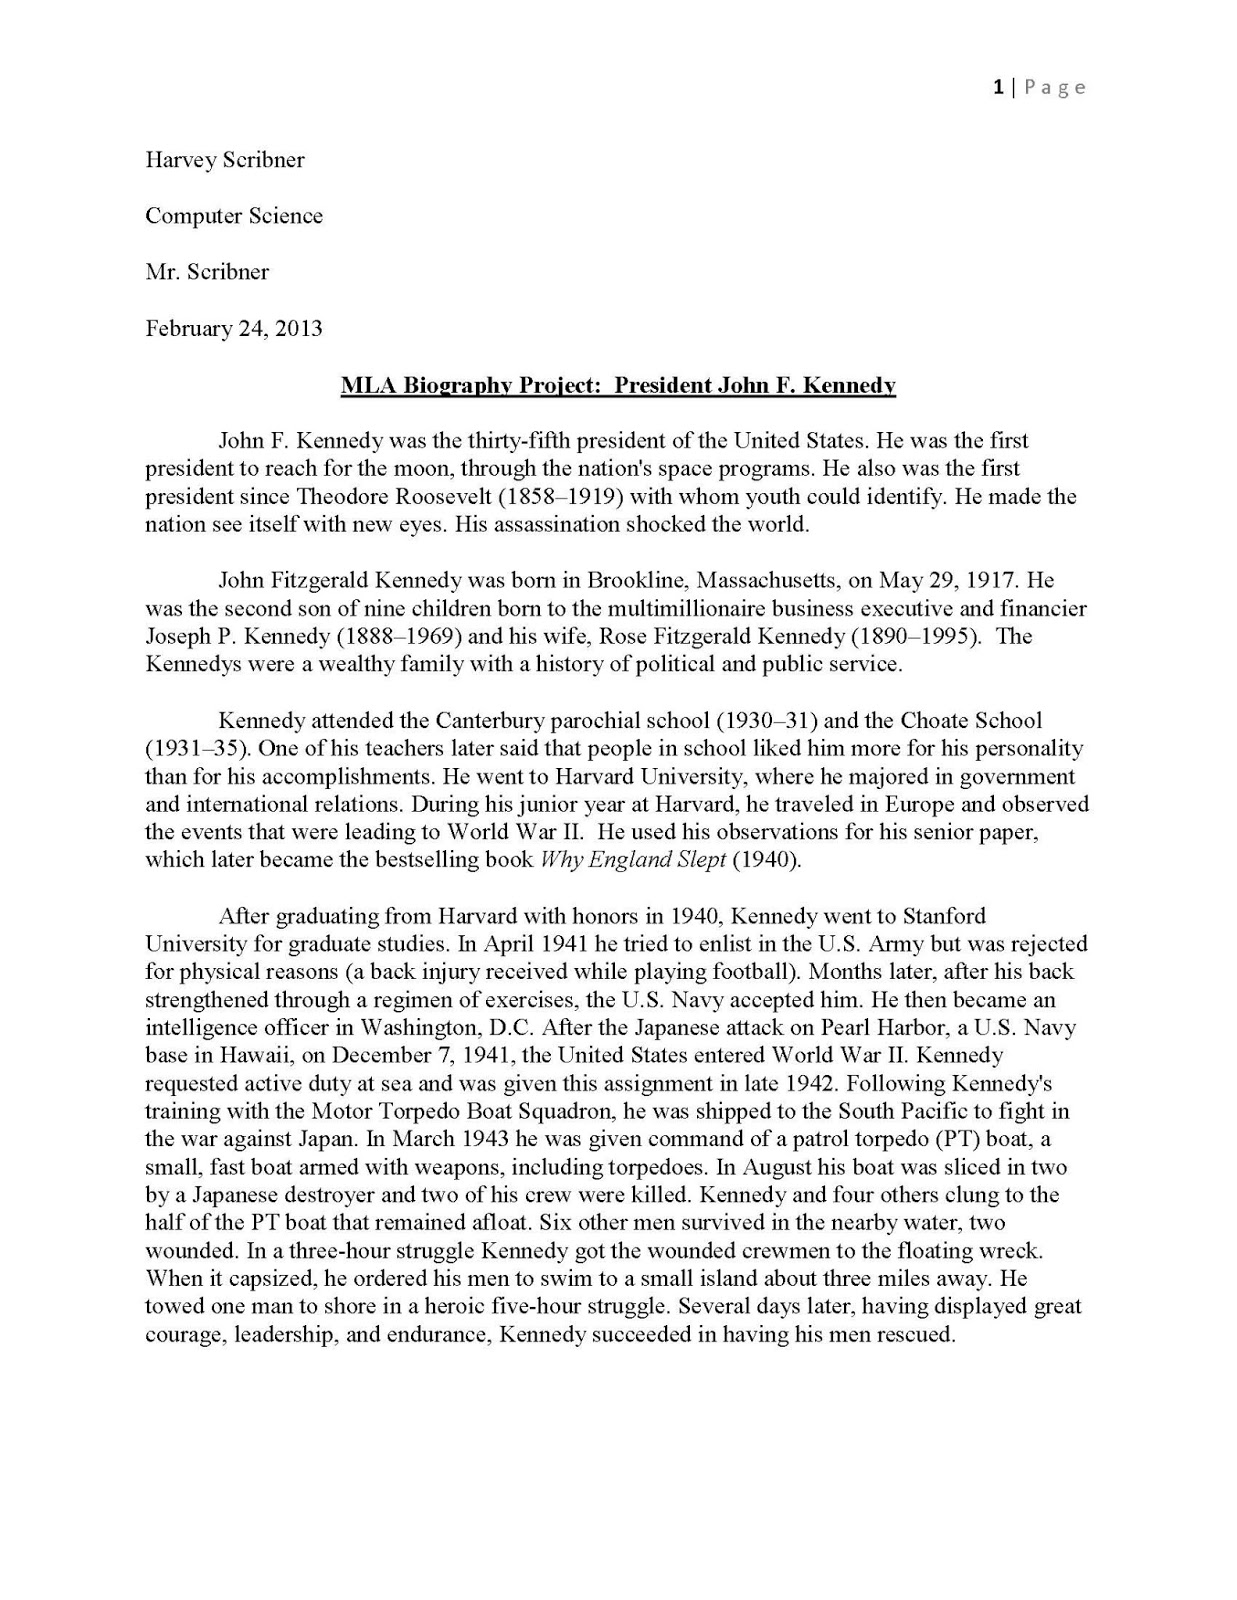 016 Jfkmlashortformbiographyreportexample Page 1 Sample Biography Essay Unforgettable About Myself Elementary Self Full